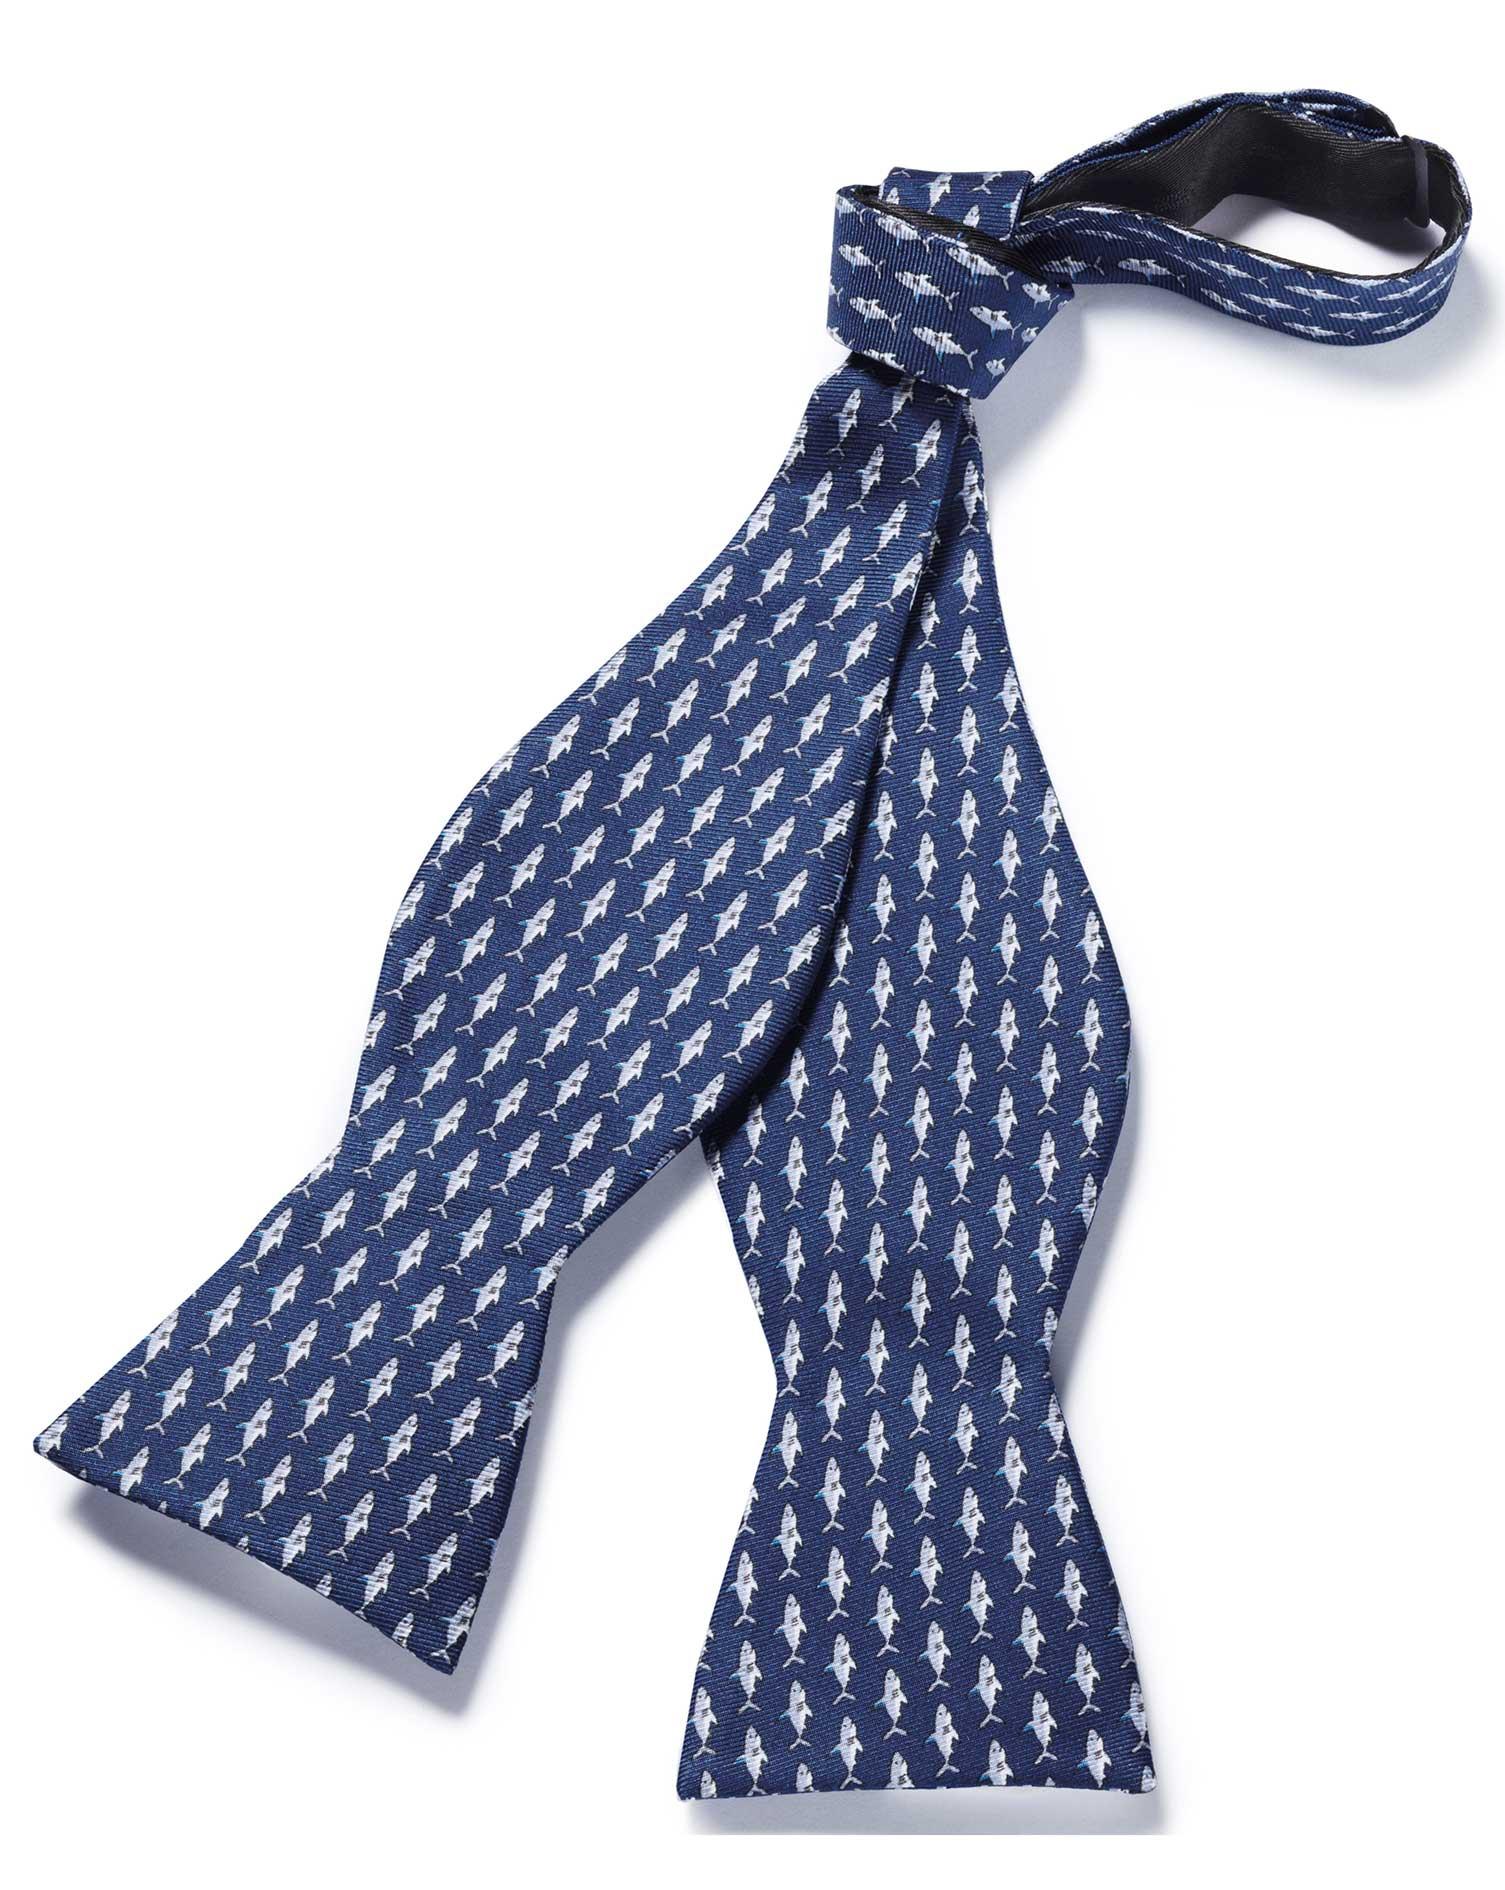 ead58905b3b Navy shark print self tie bow tie